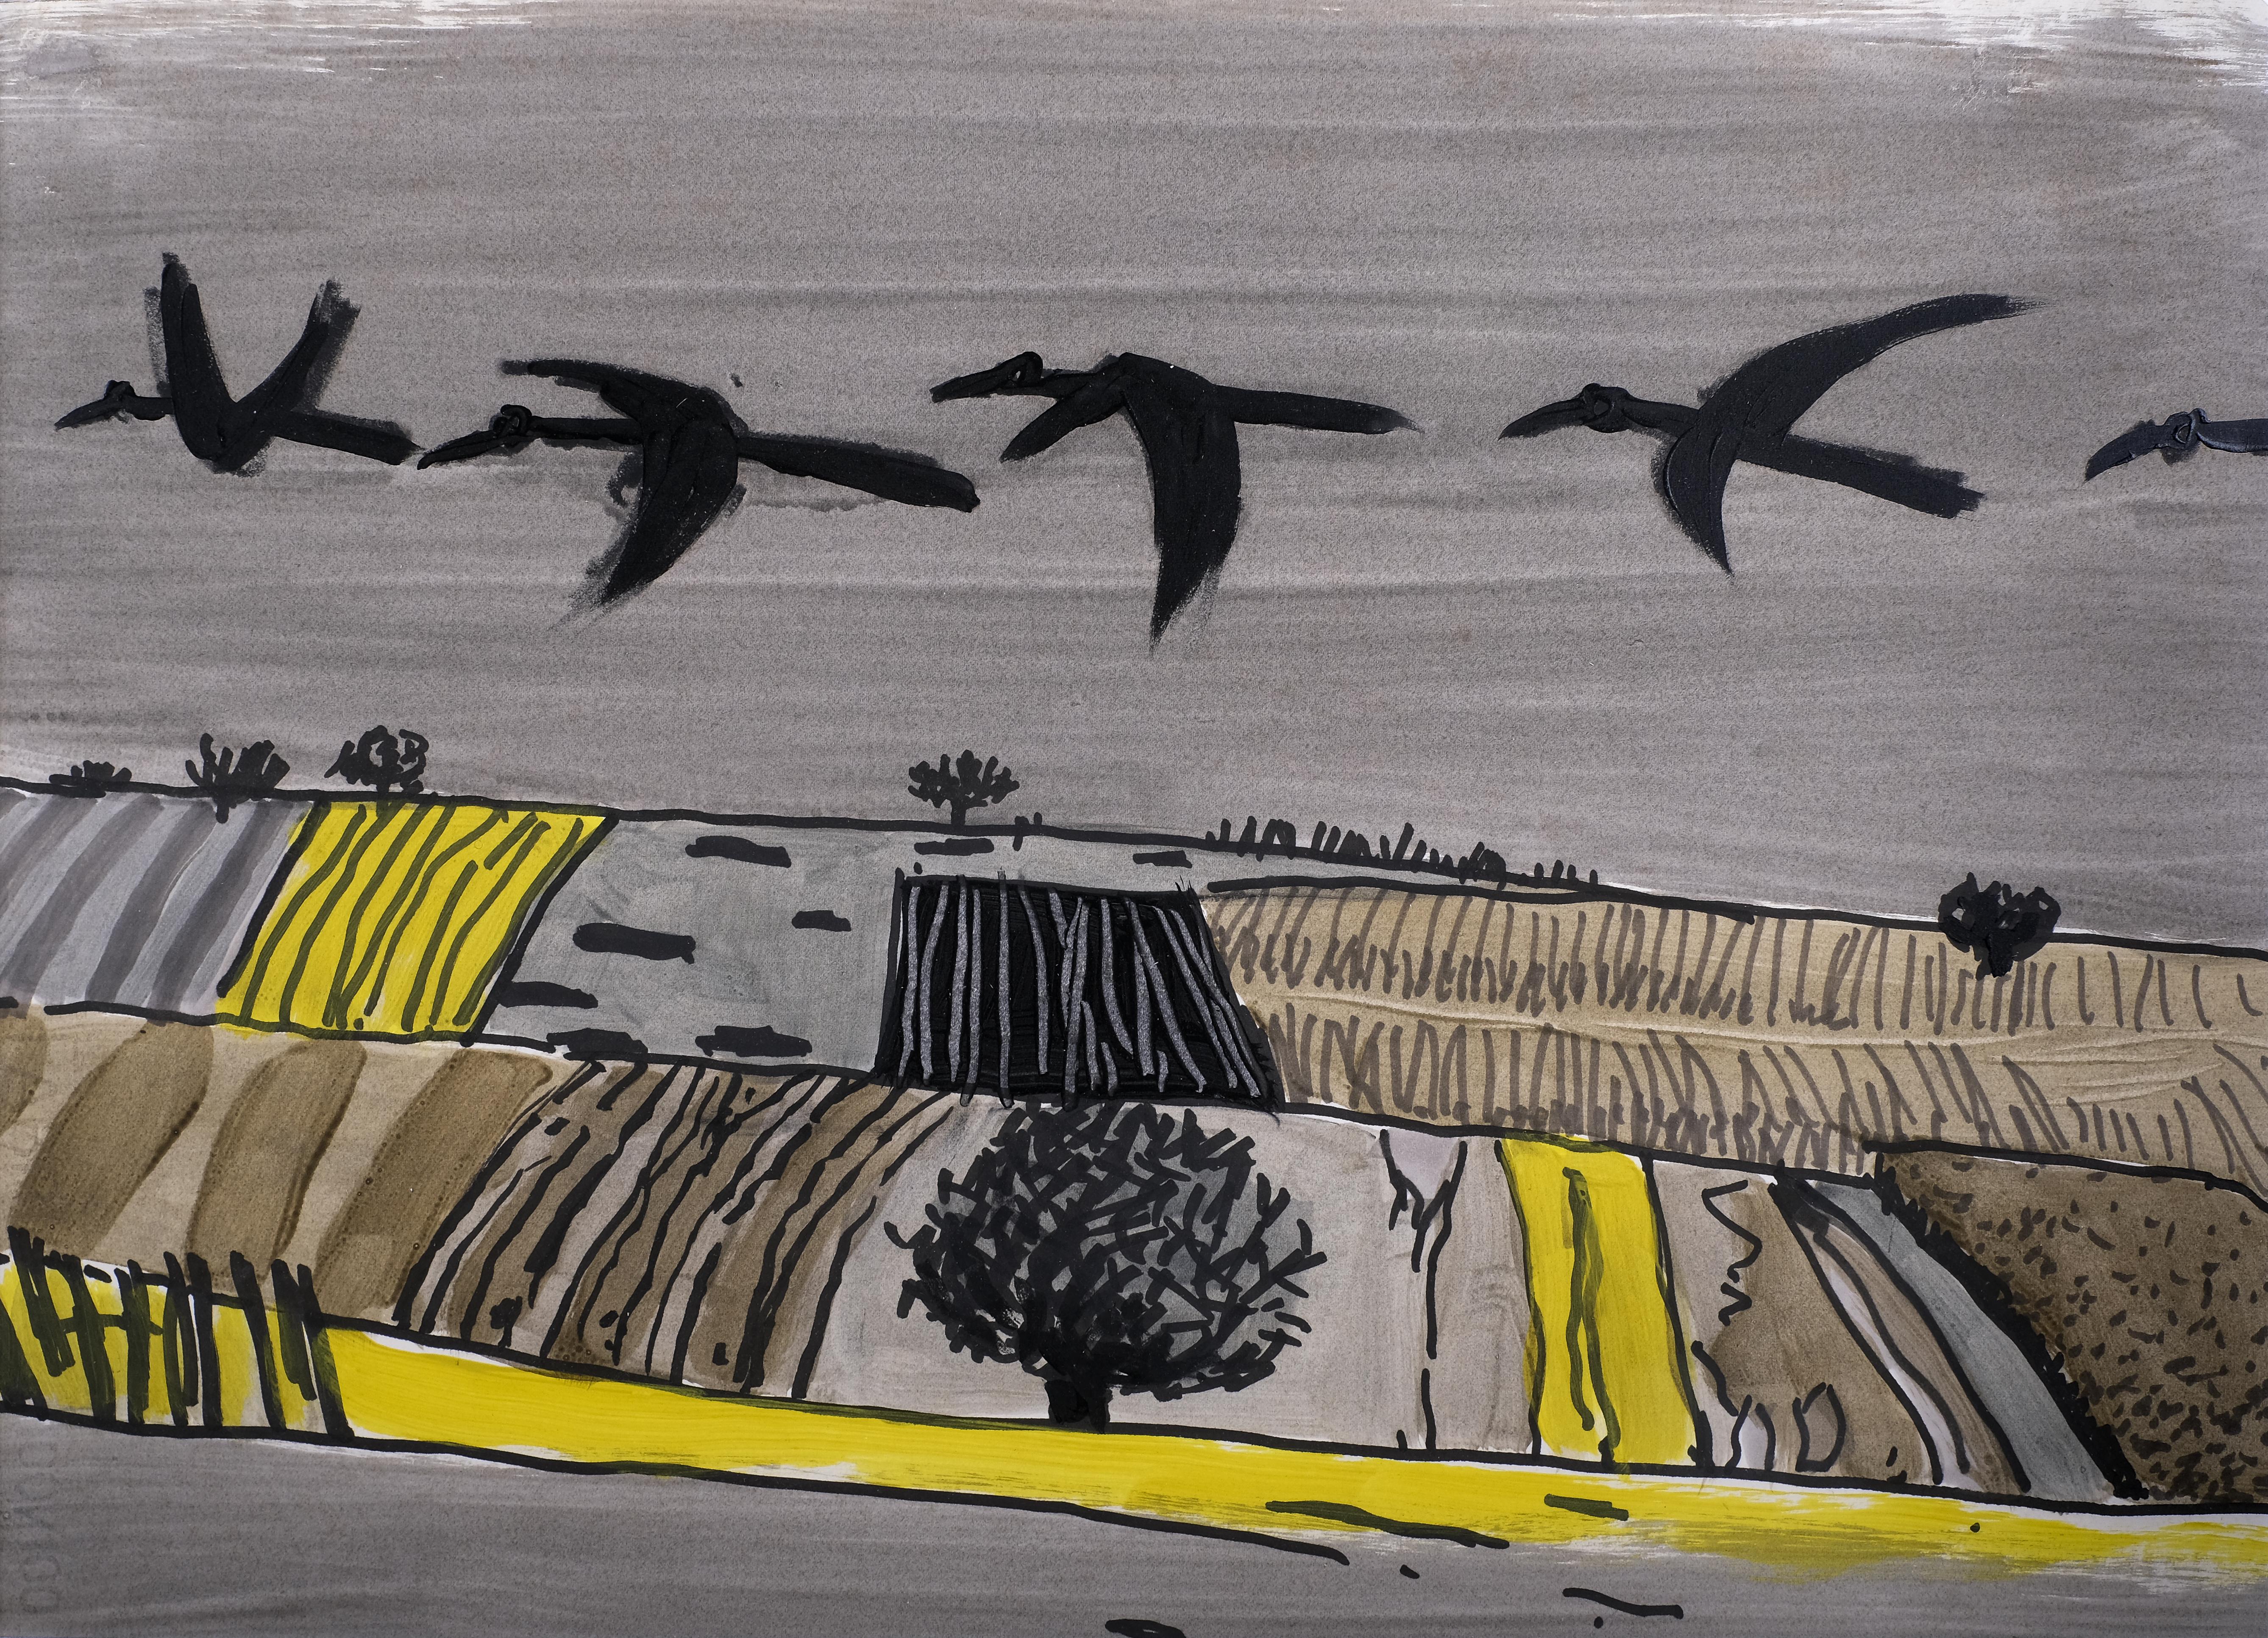 Angelo Ruga - S.T. - Tec. mista su carta 47x33 - 1994